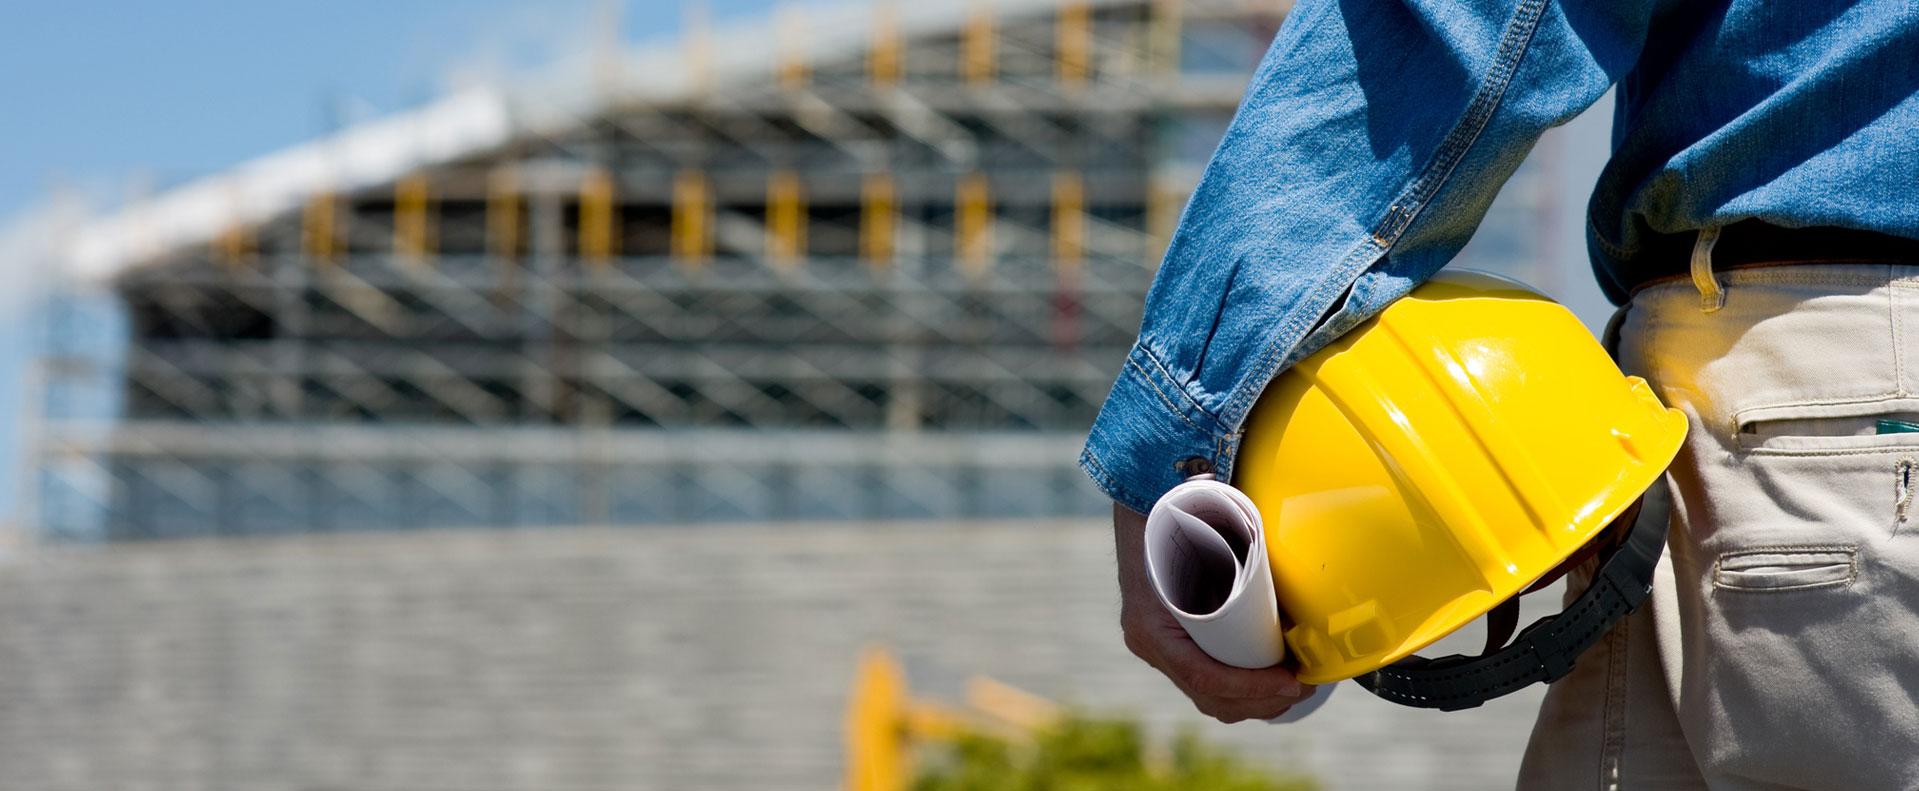 Costruzioni e ristrutturazioni Fraternali Cristian Impresa edile